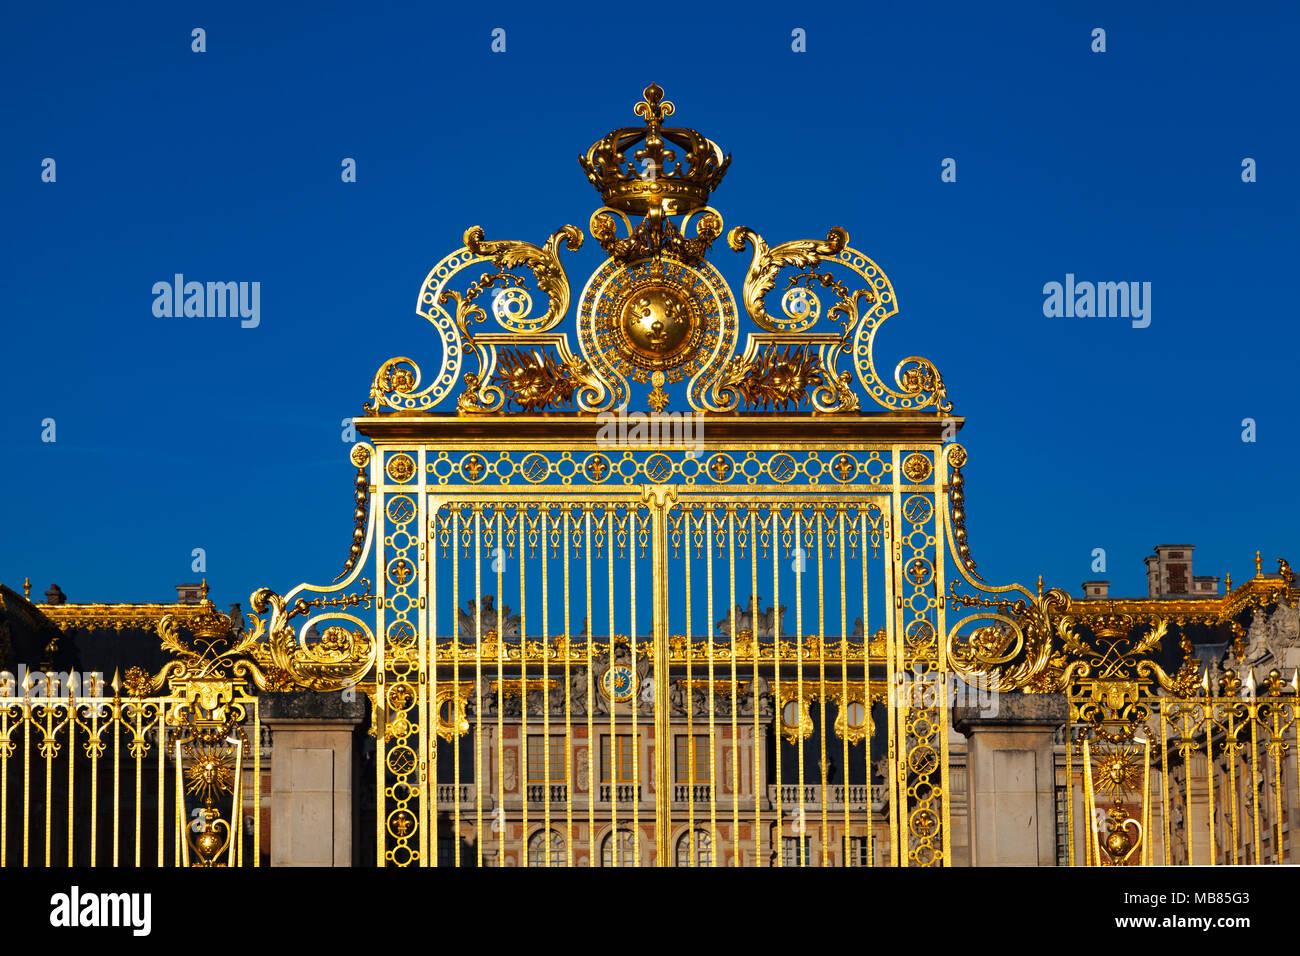 Chateau de Versailles (Palace of Versailles), a UNESCO World Heritage Site, France - The Gate of Honour - Stock Image